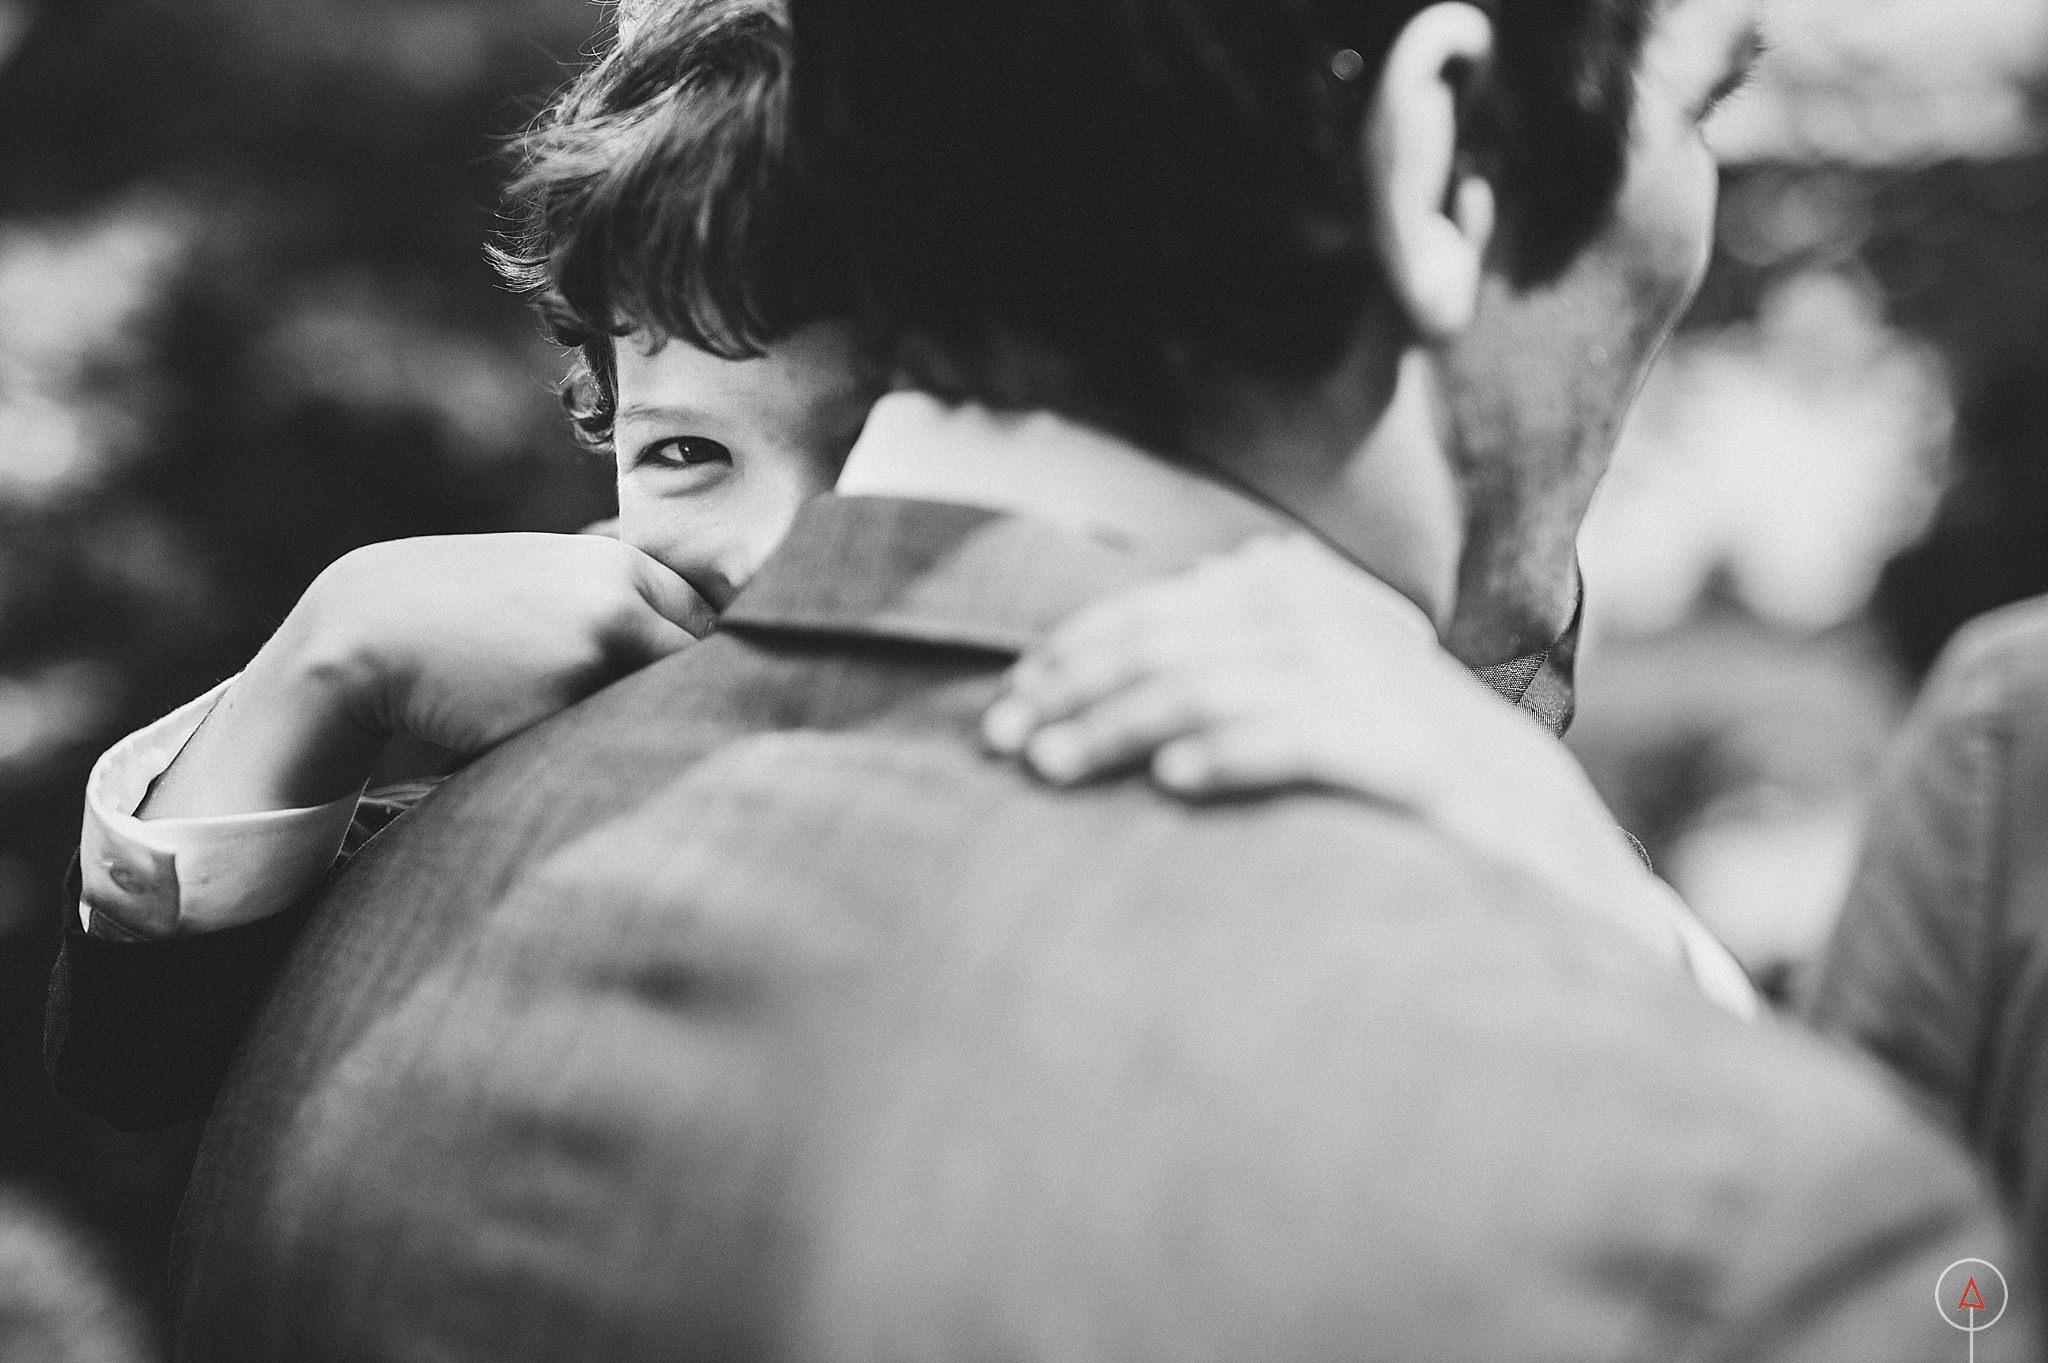 cardiff-wedding-photographer-aga-tomaszek_0377